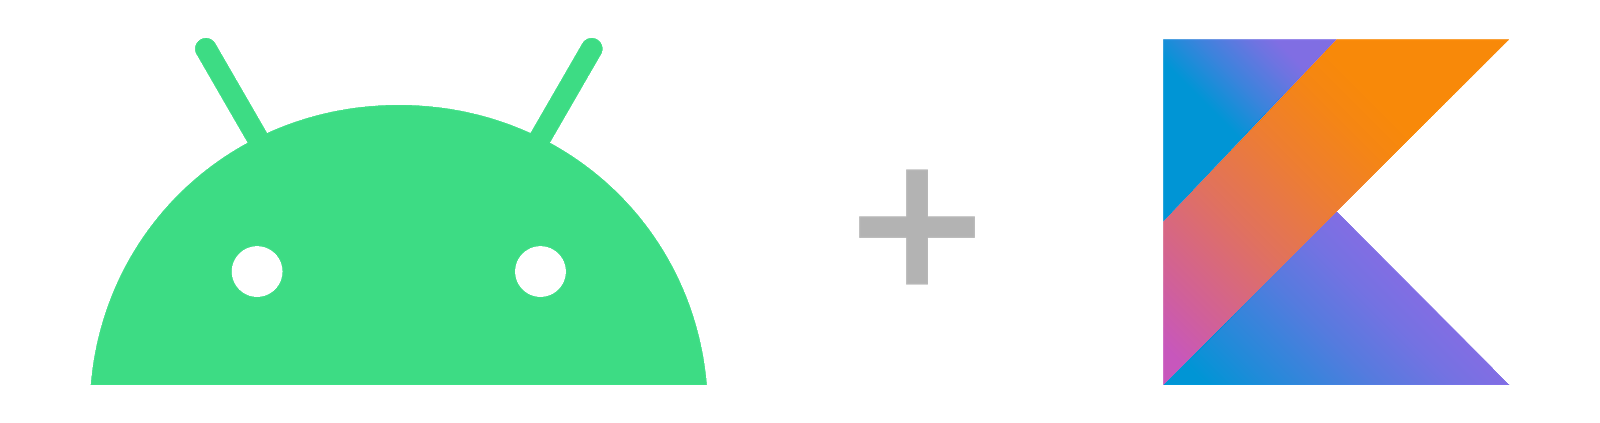 Android 로고와 Kotlin 로고